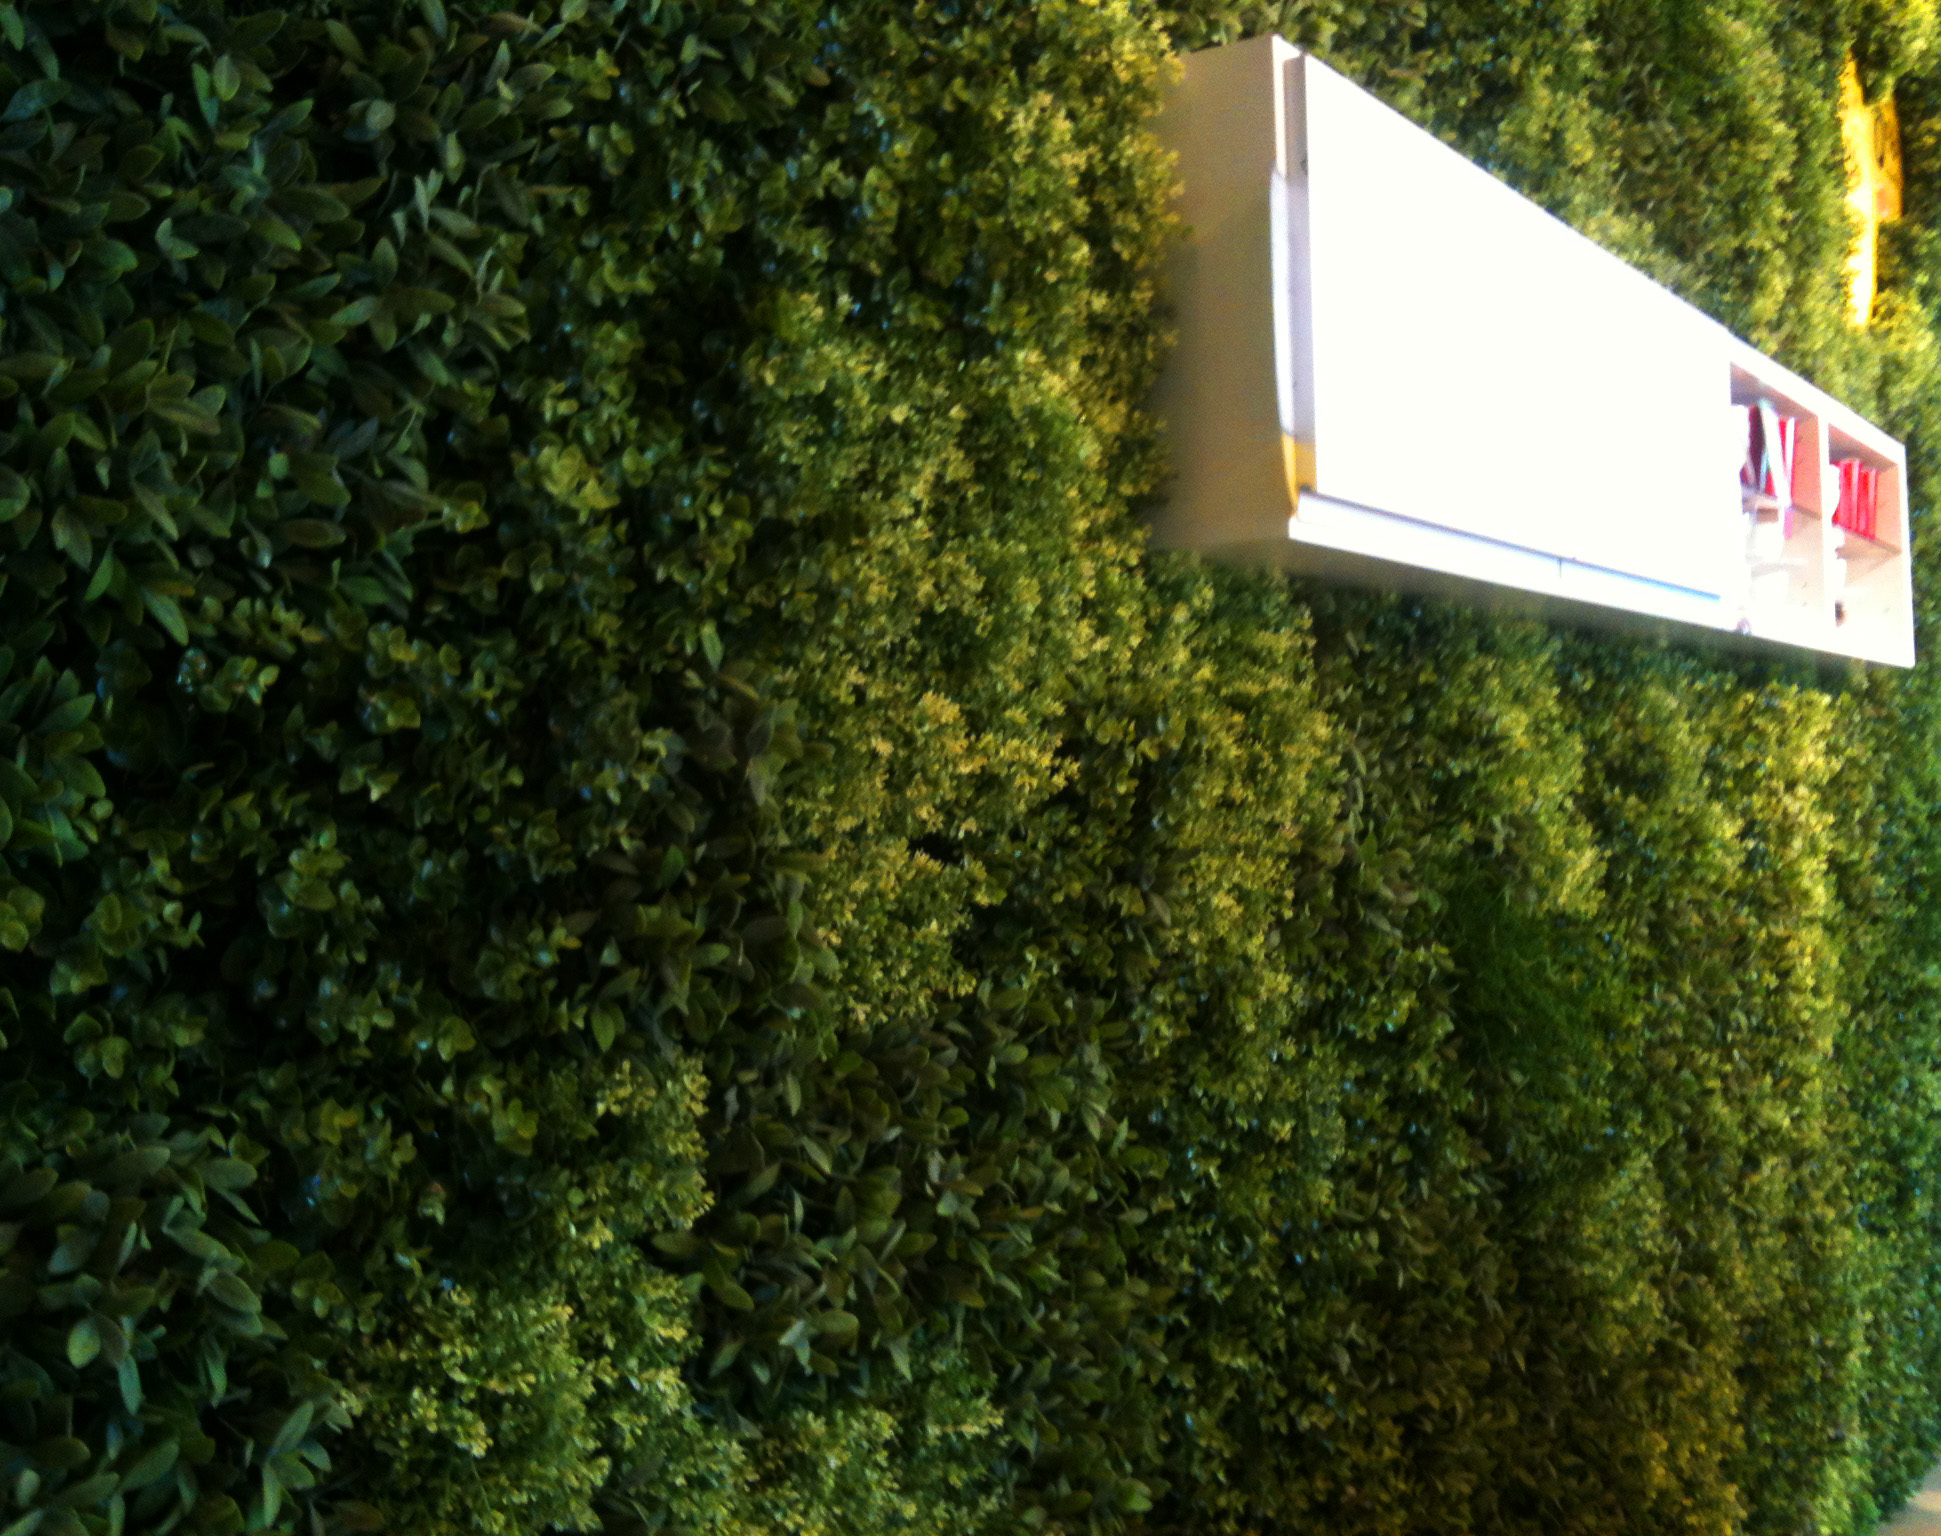 jardin vertical nataliagustafsonblog. Black Bedroom Furniture Sets. Home Design Ideas